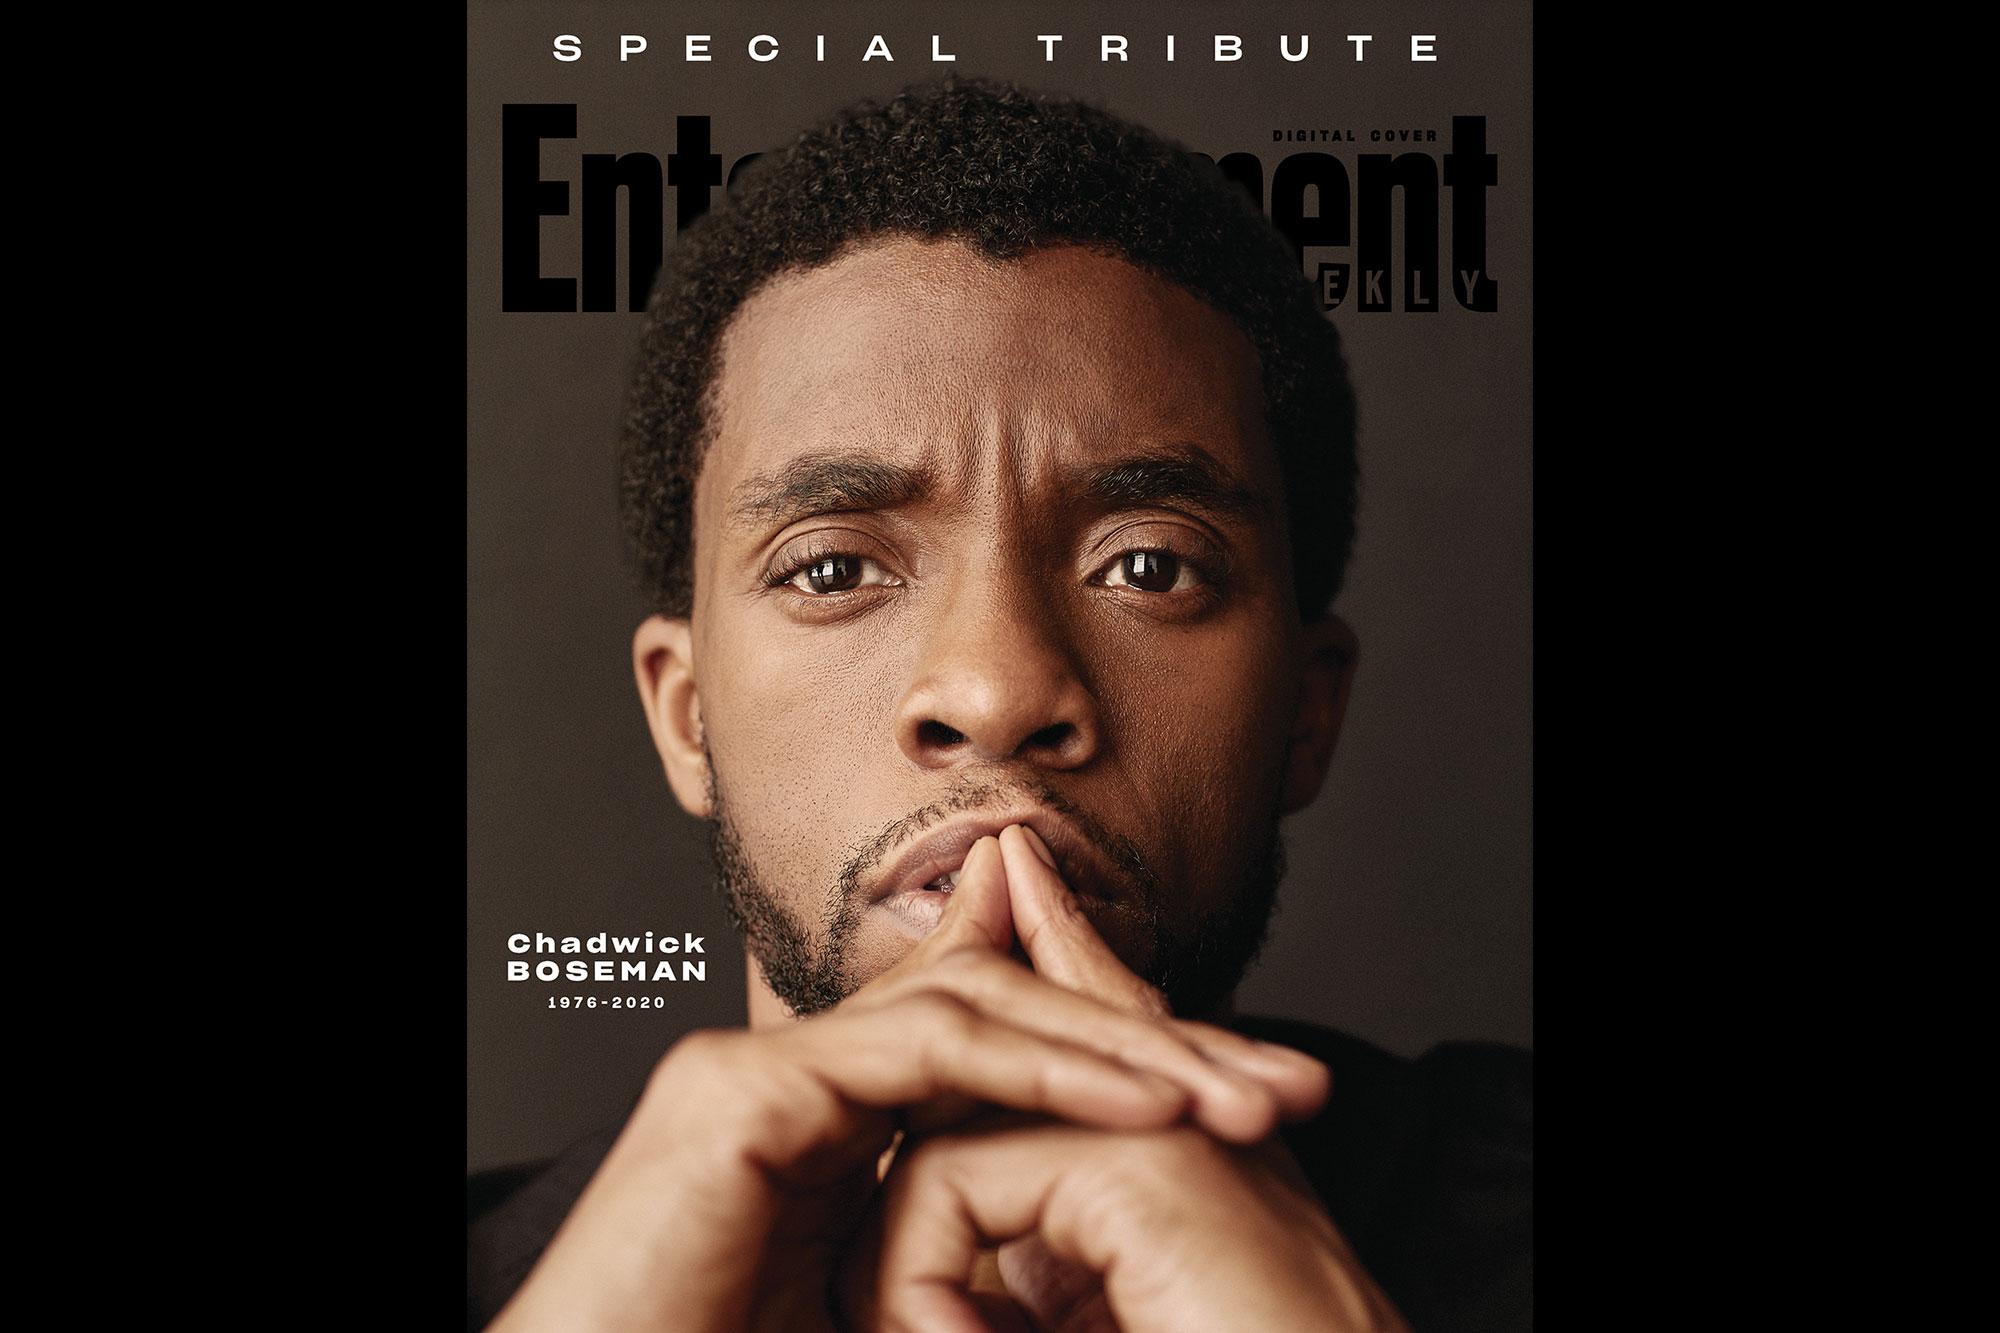 Chadwick Boseman EW Tribute cover